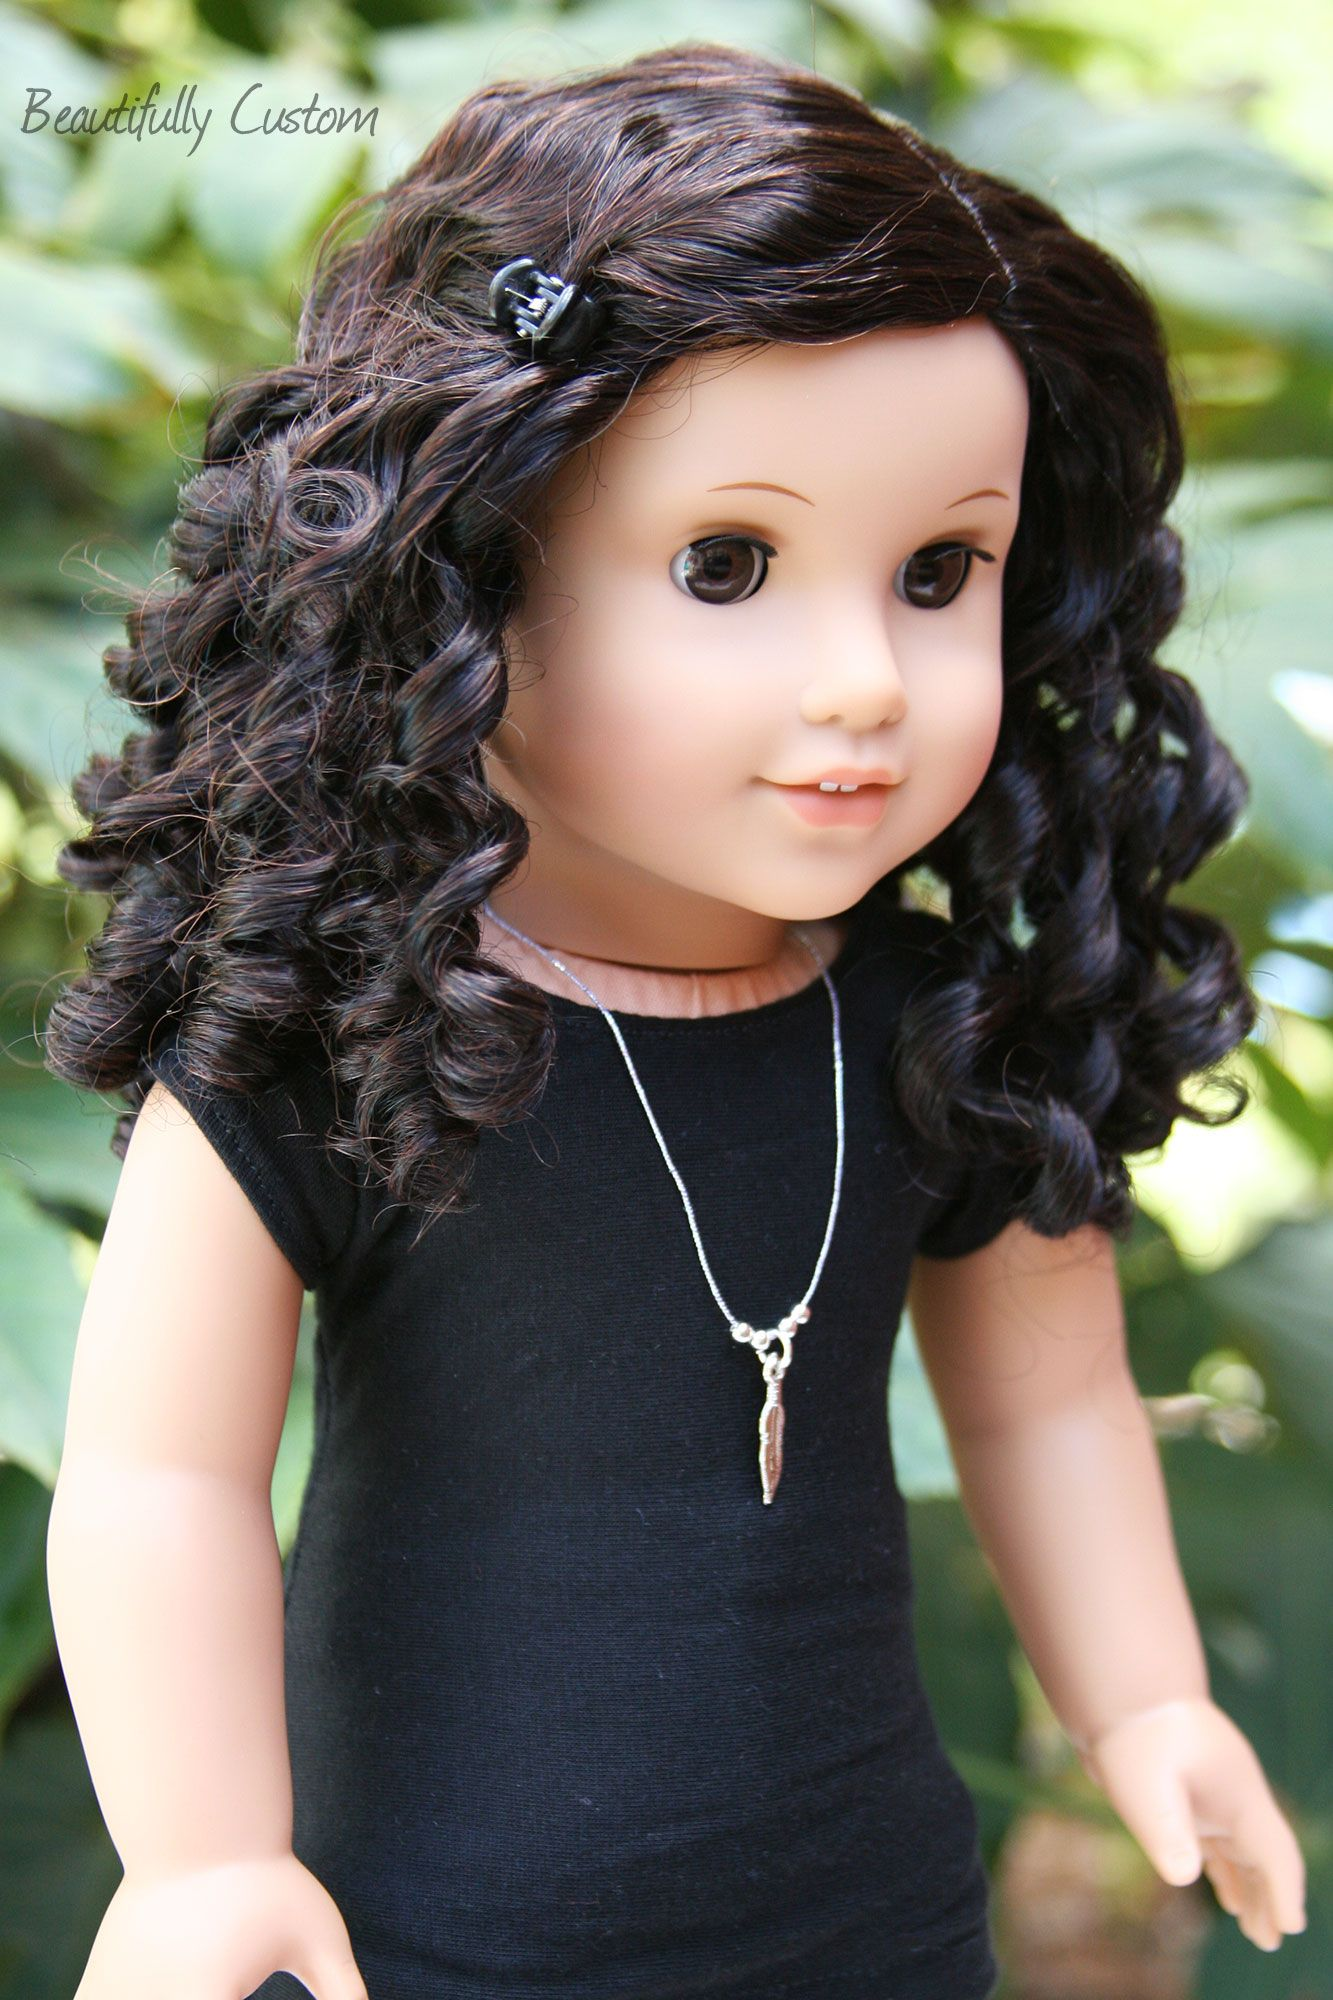 Custom American Girl Doll Brown Eyes and Short Curly Black Dark